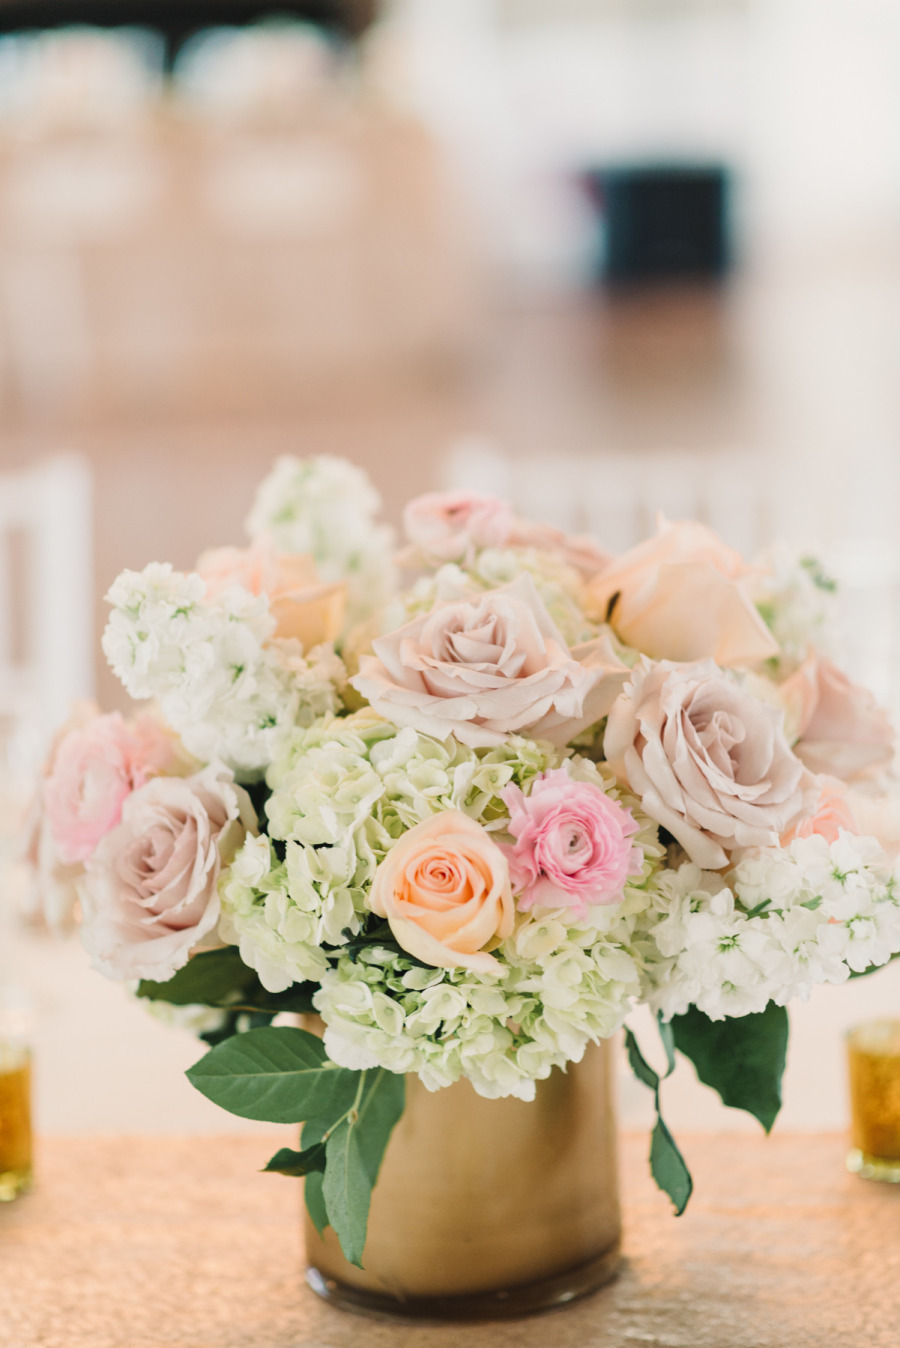 gold elegant wedding | Photography Michelle Lange - michellelange.com